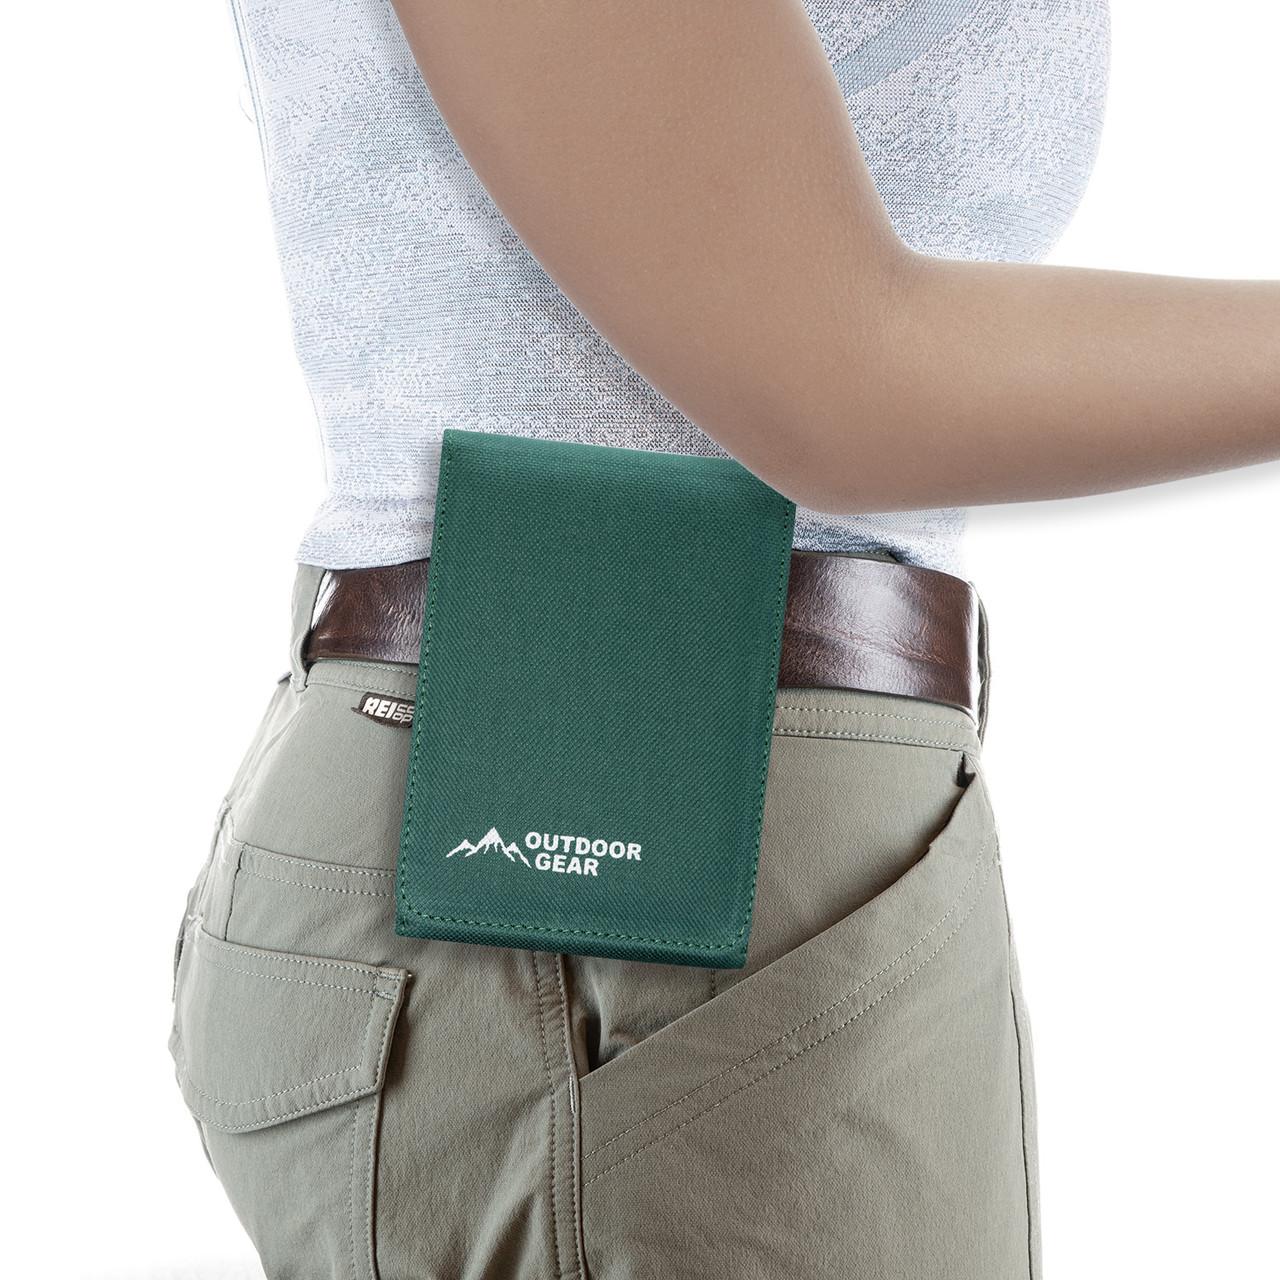 Springfield XDE 9mm Green Covert Series Holster